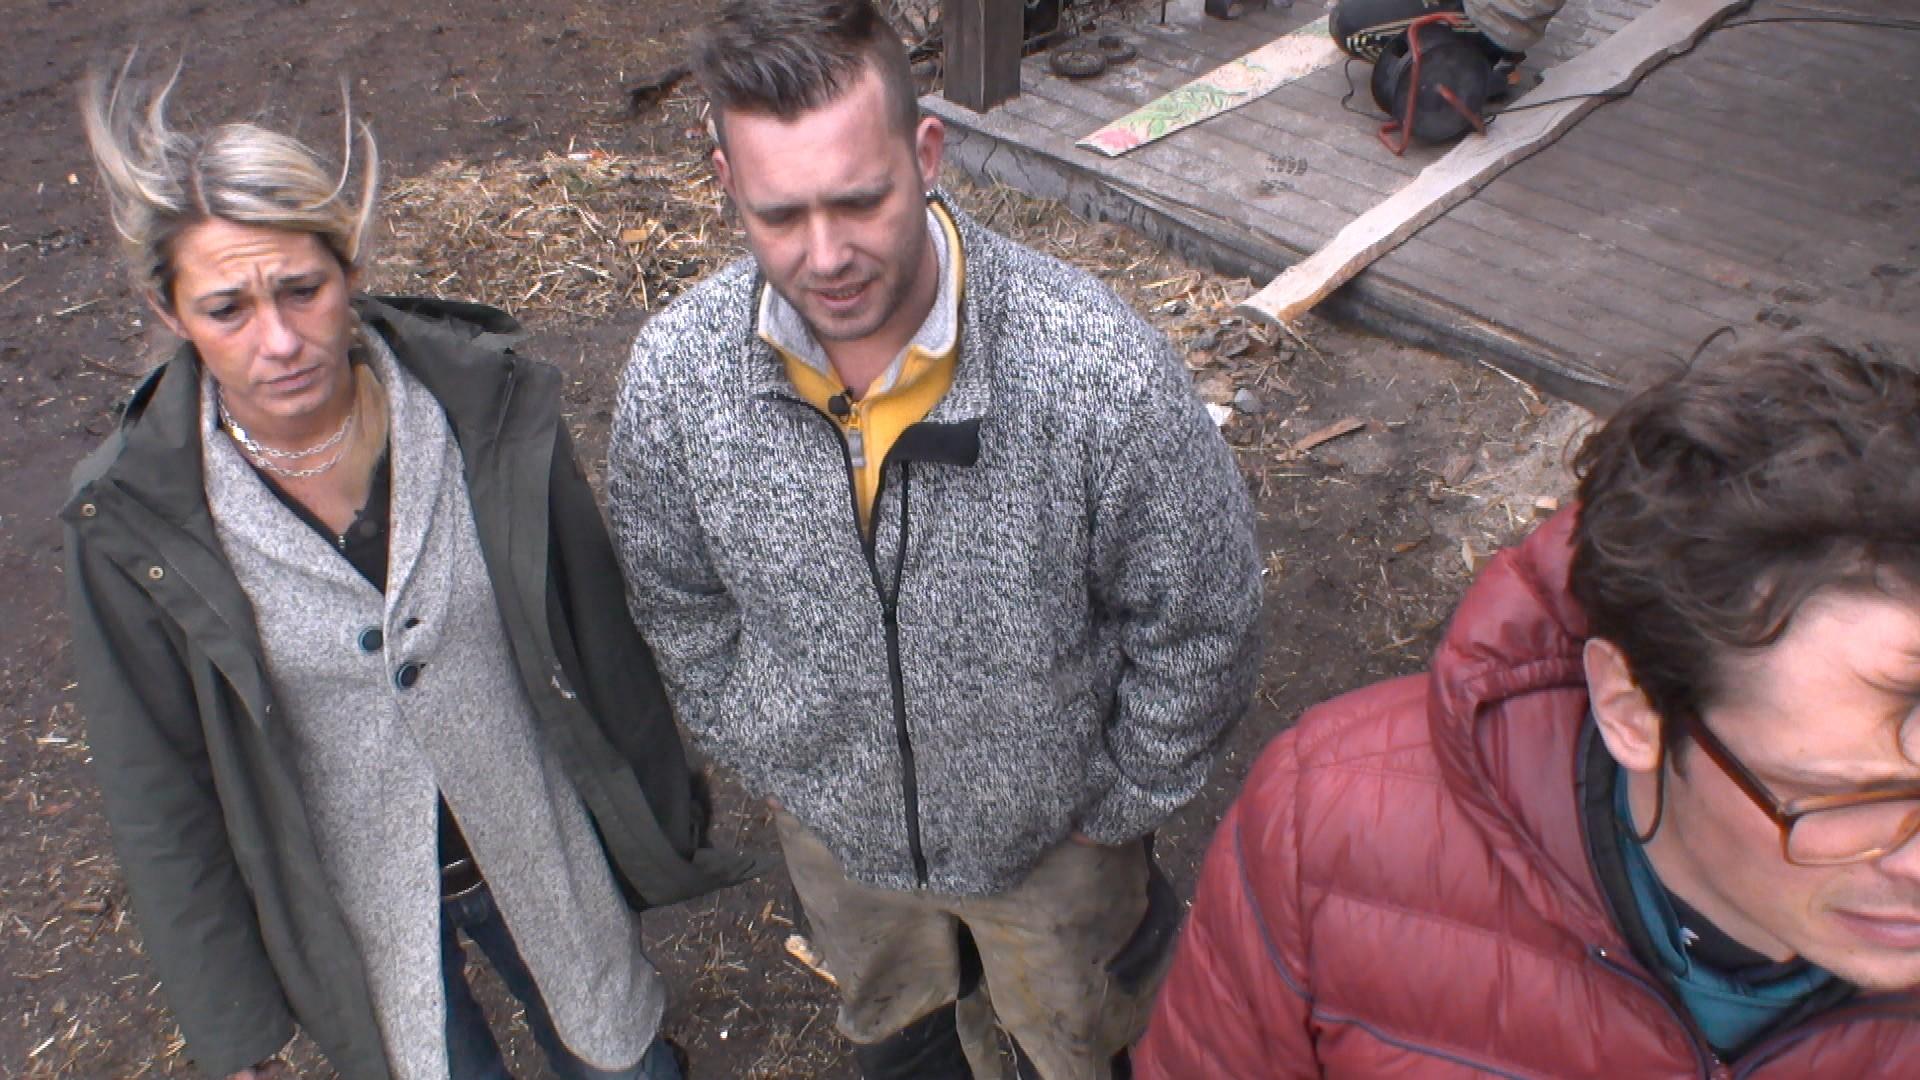 Newtopia Episode 28 01.04.2015 Osterbasar Vorbereitungen Unwetter